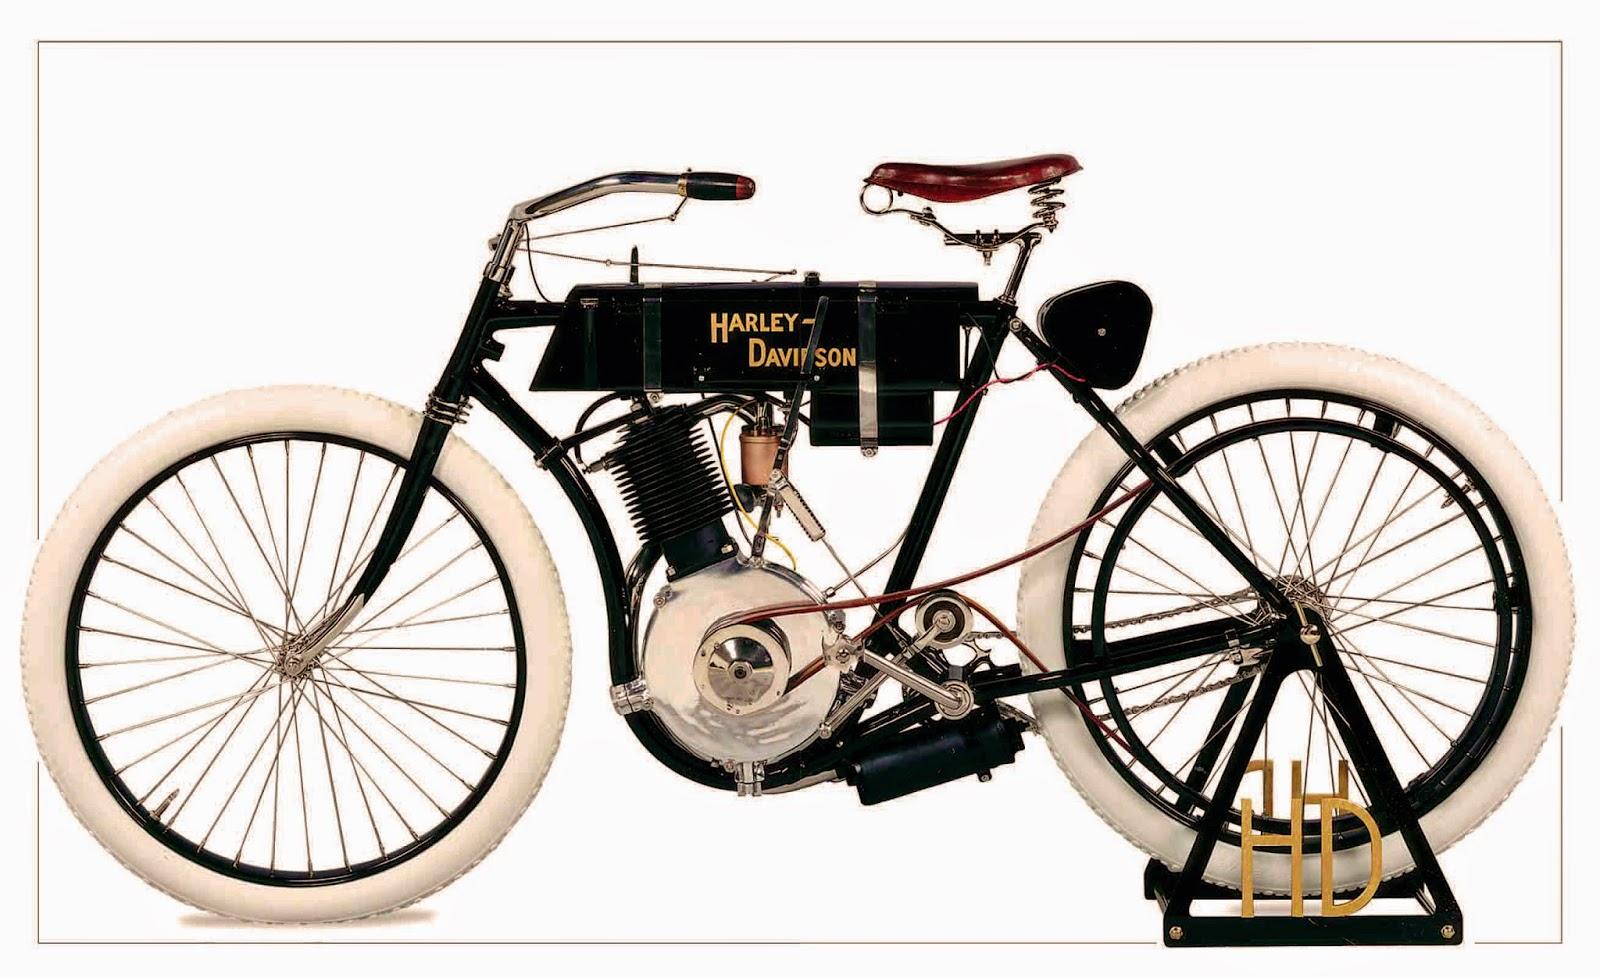 Harley-Davidson Model 1 on white background